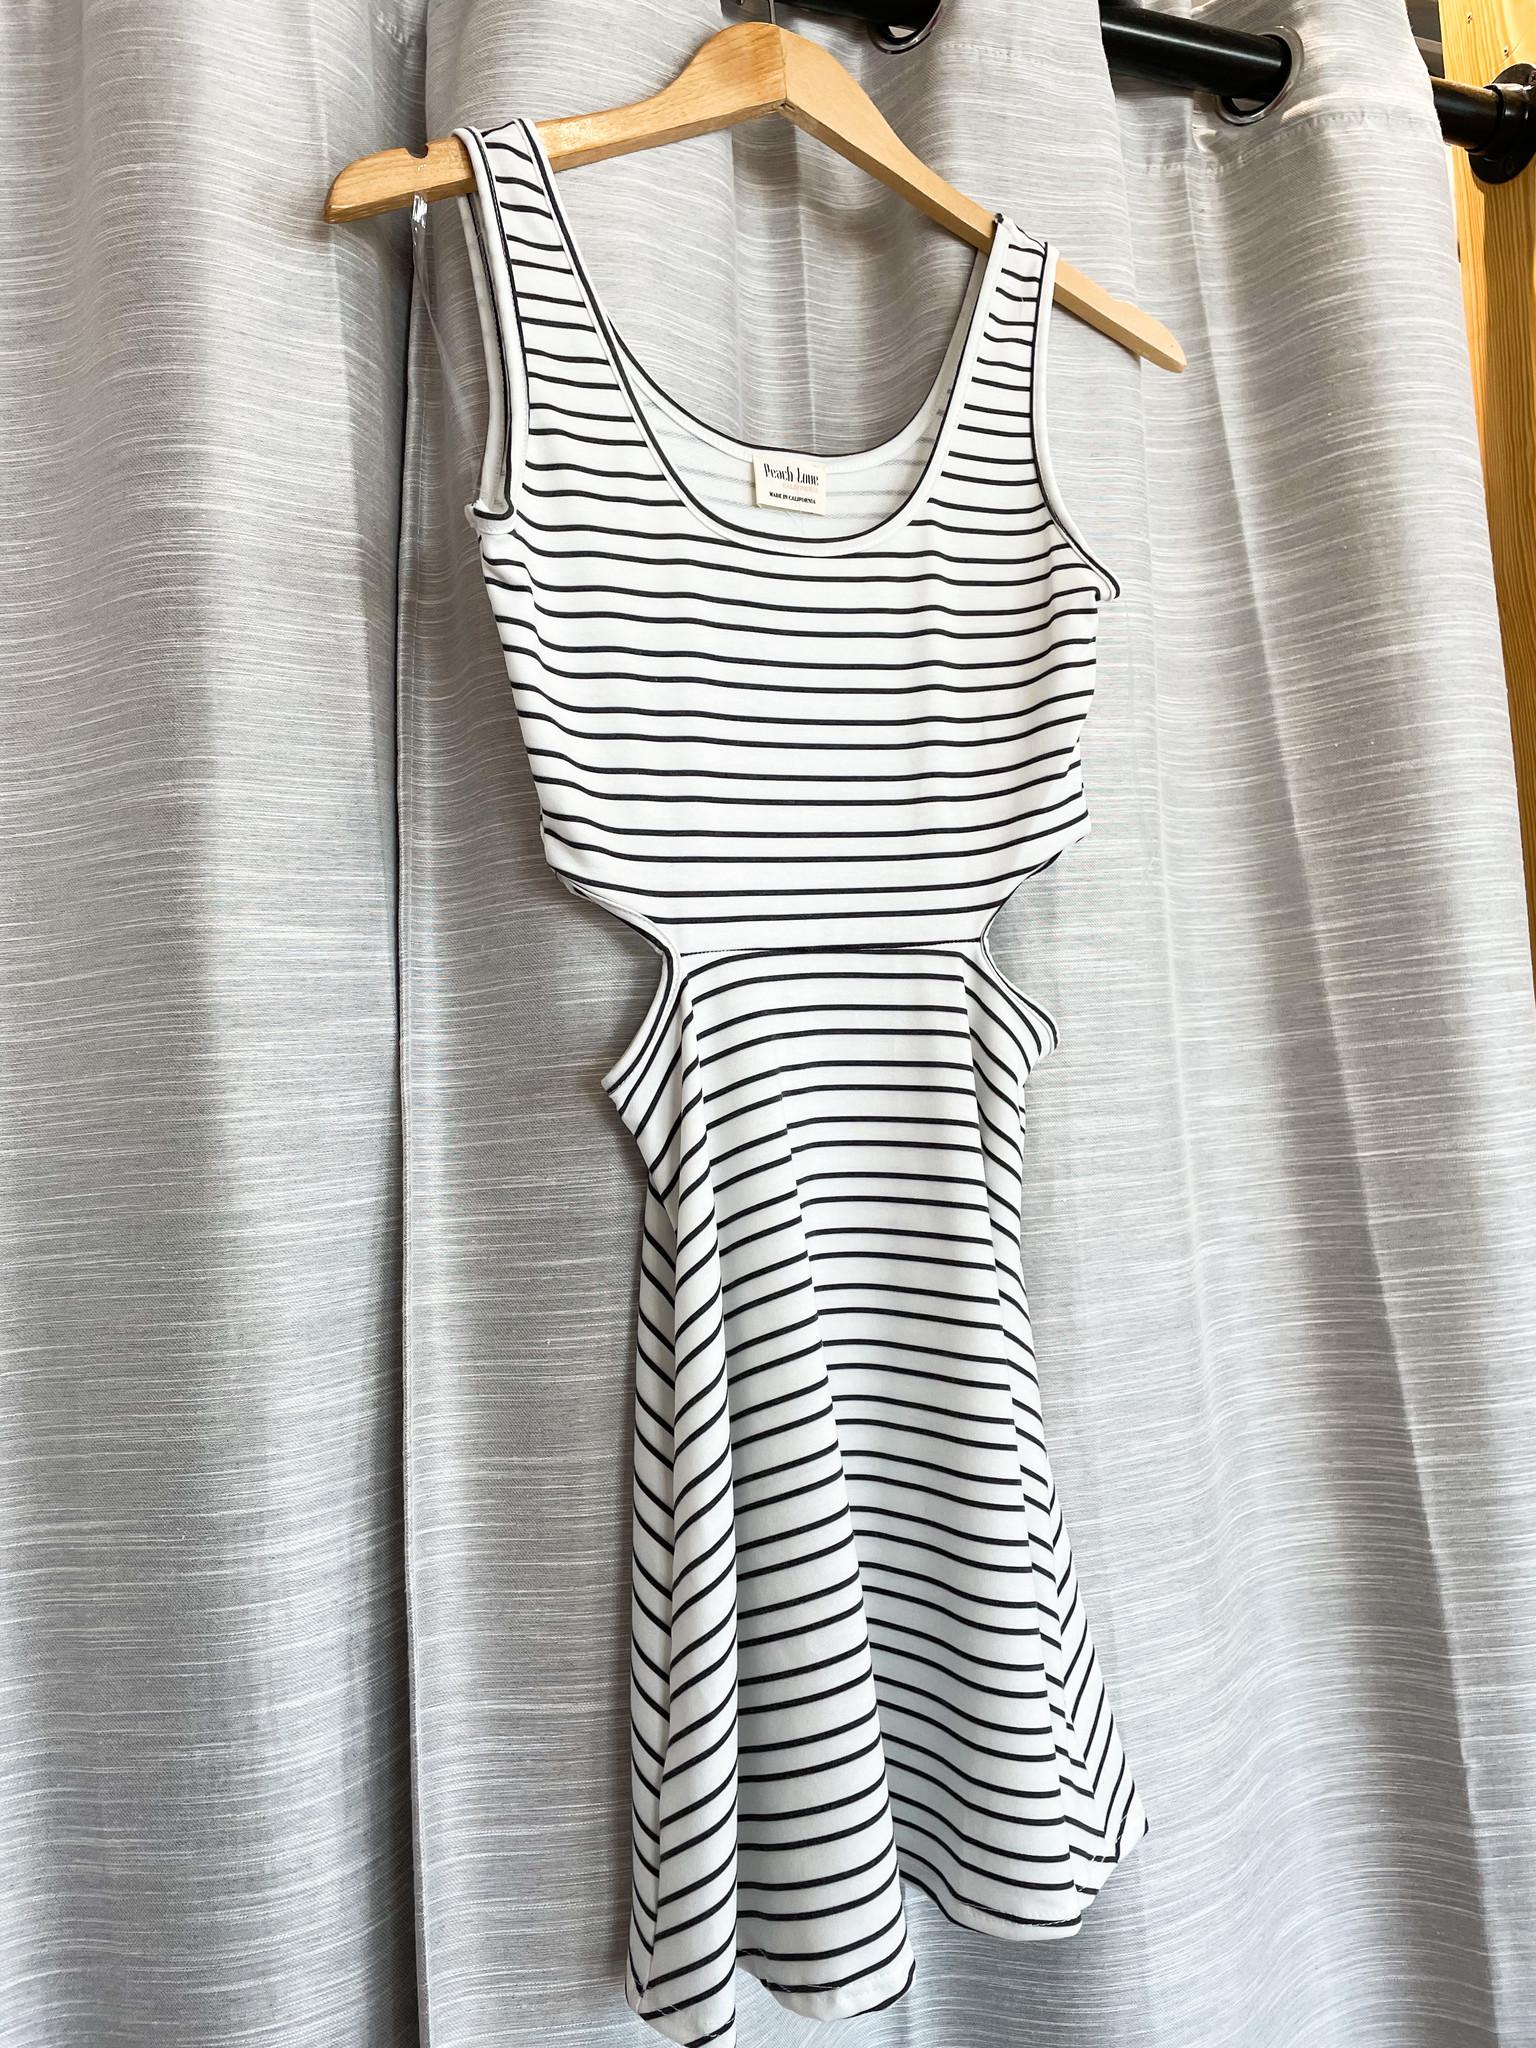 Off White/Black Striped Sleeveless Dress